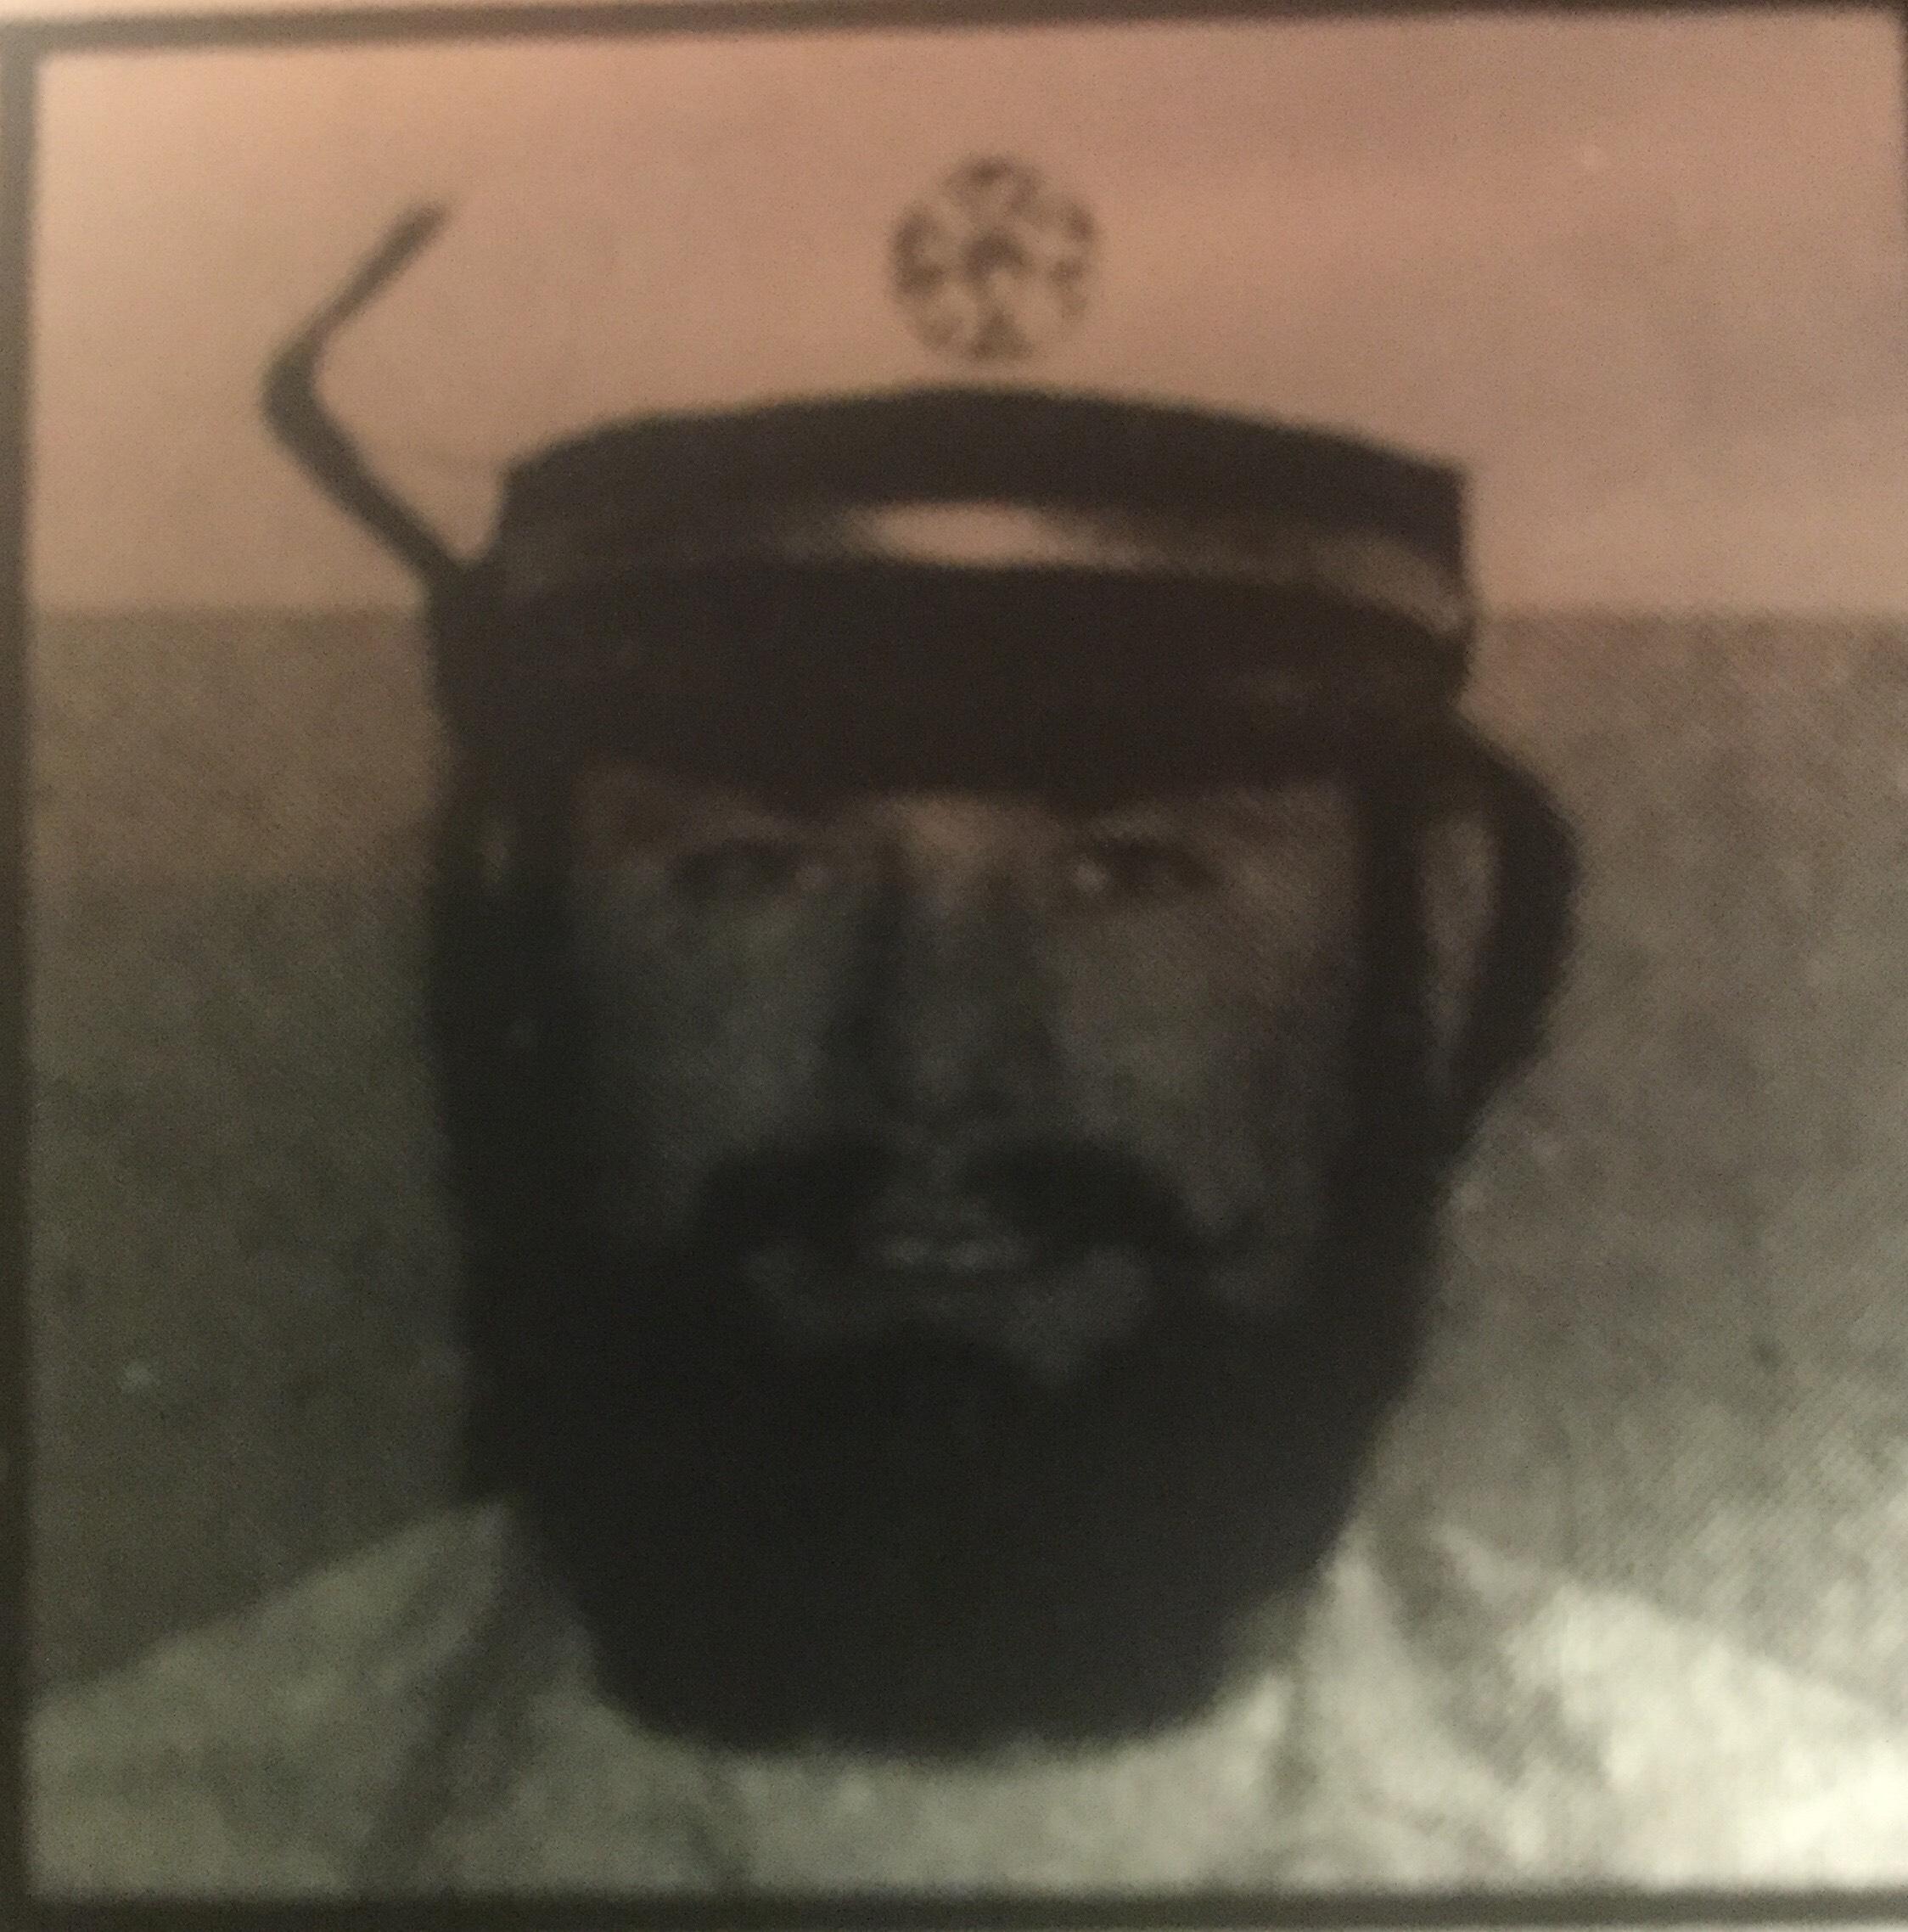 Chief Arnauld Semmelrock